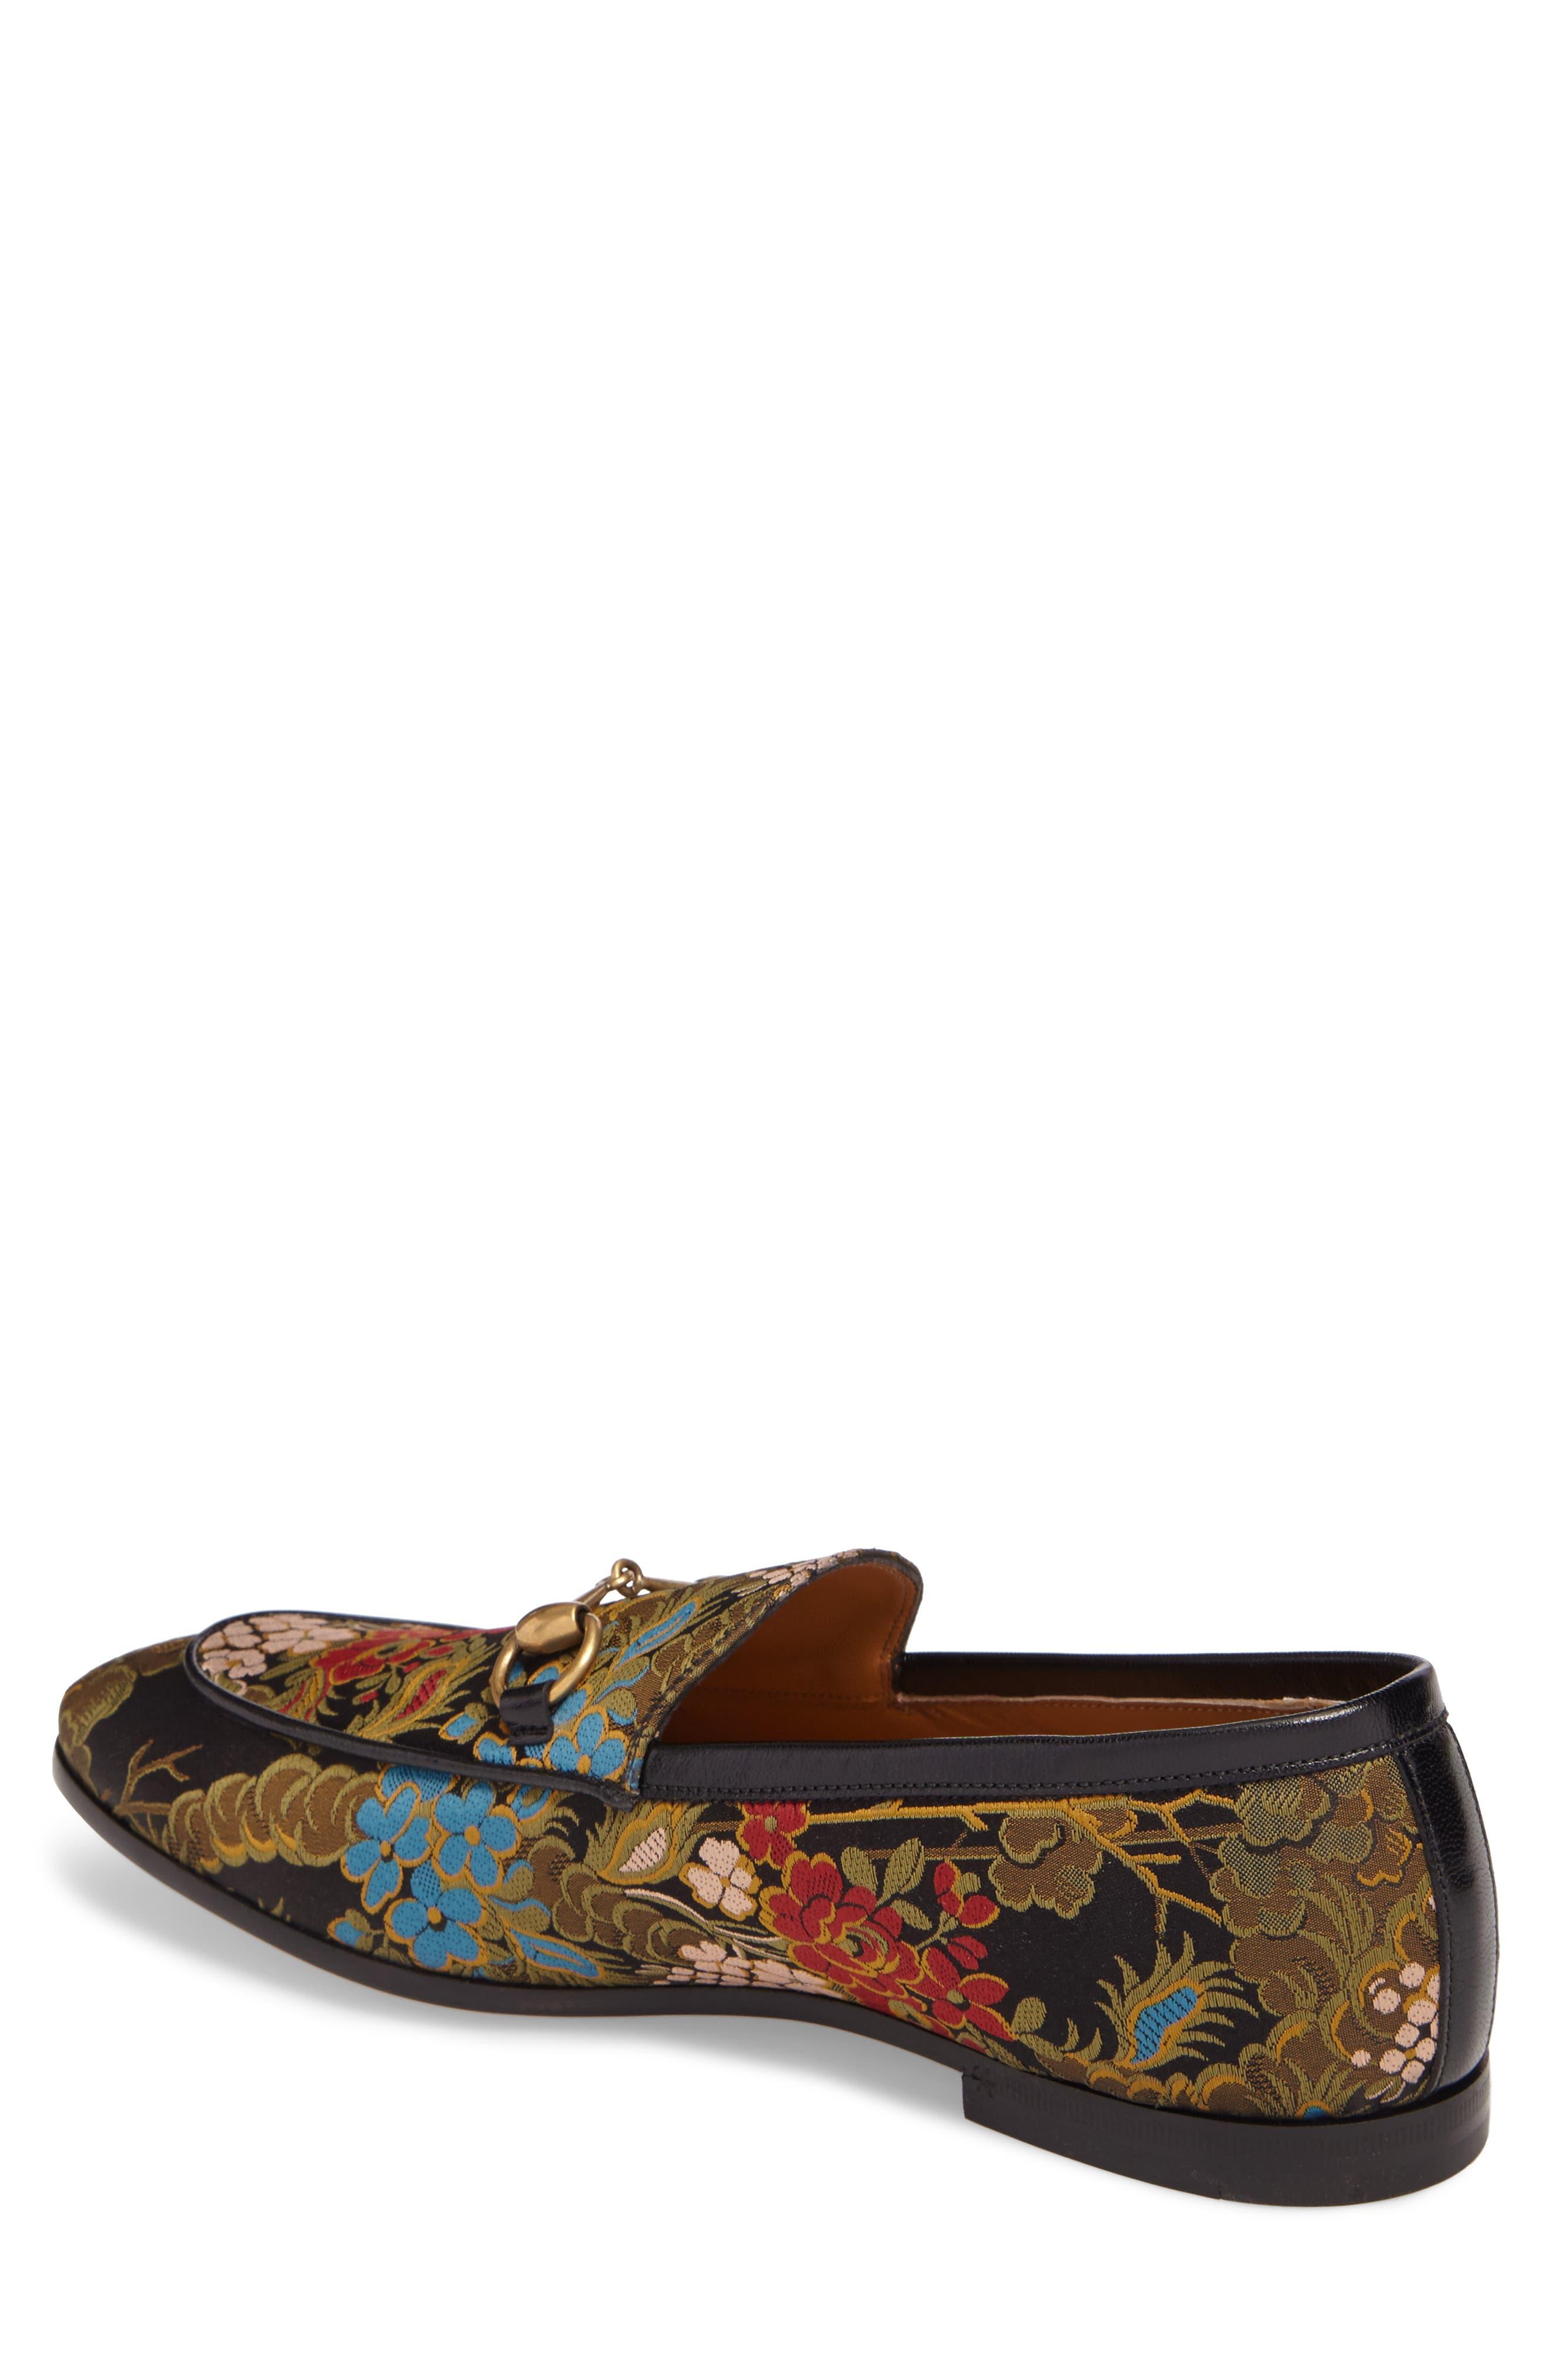 Alternate Image 2  - Gucci Jordaan Jacquard Bit Loafer (Men)